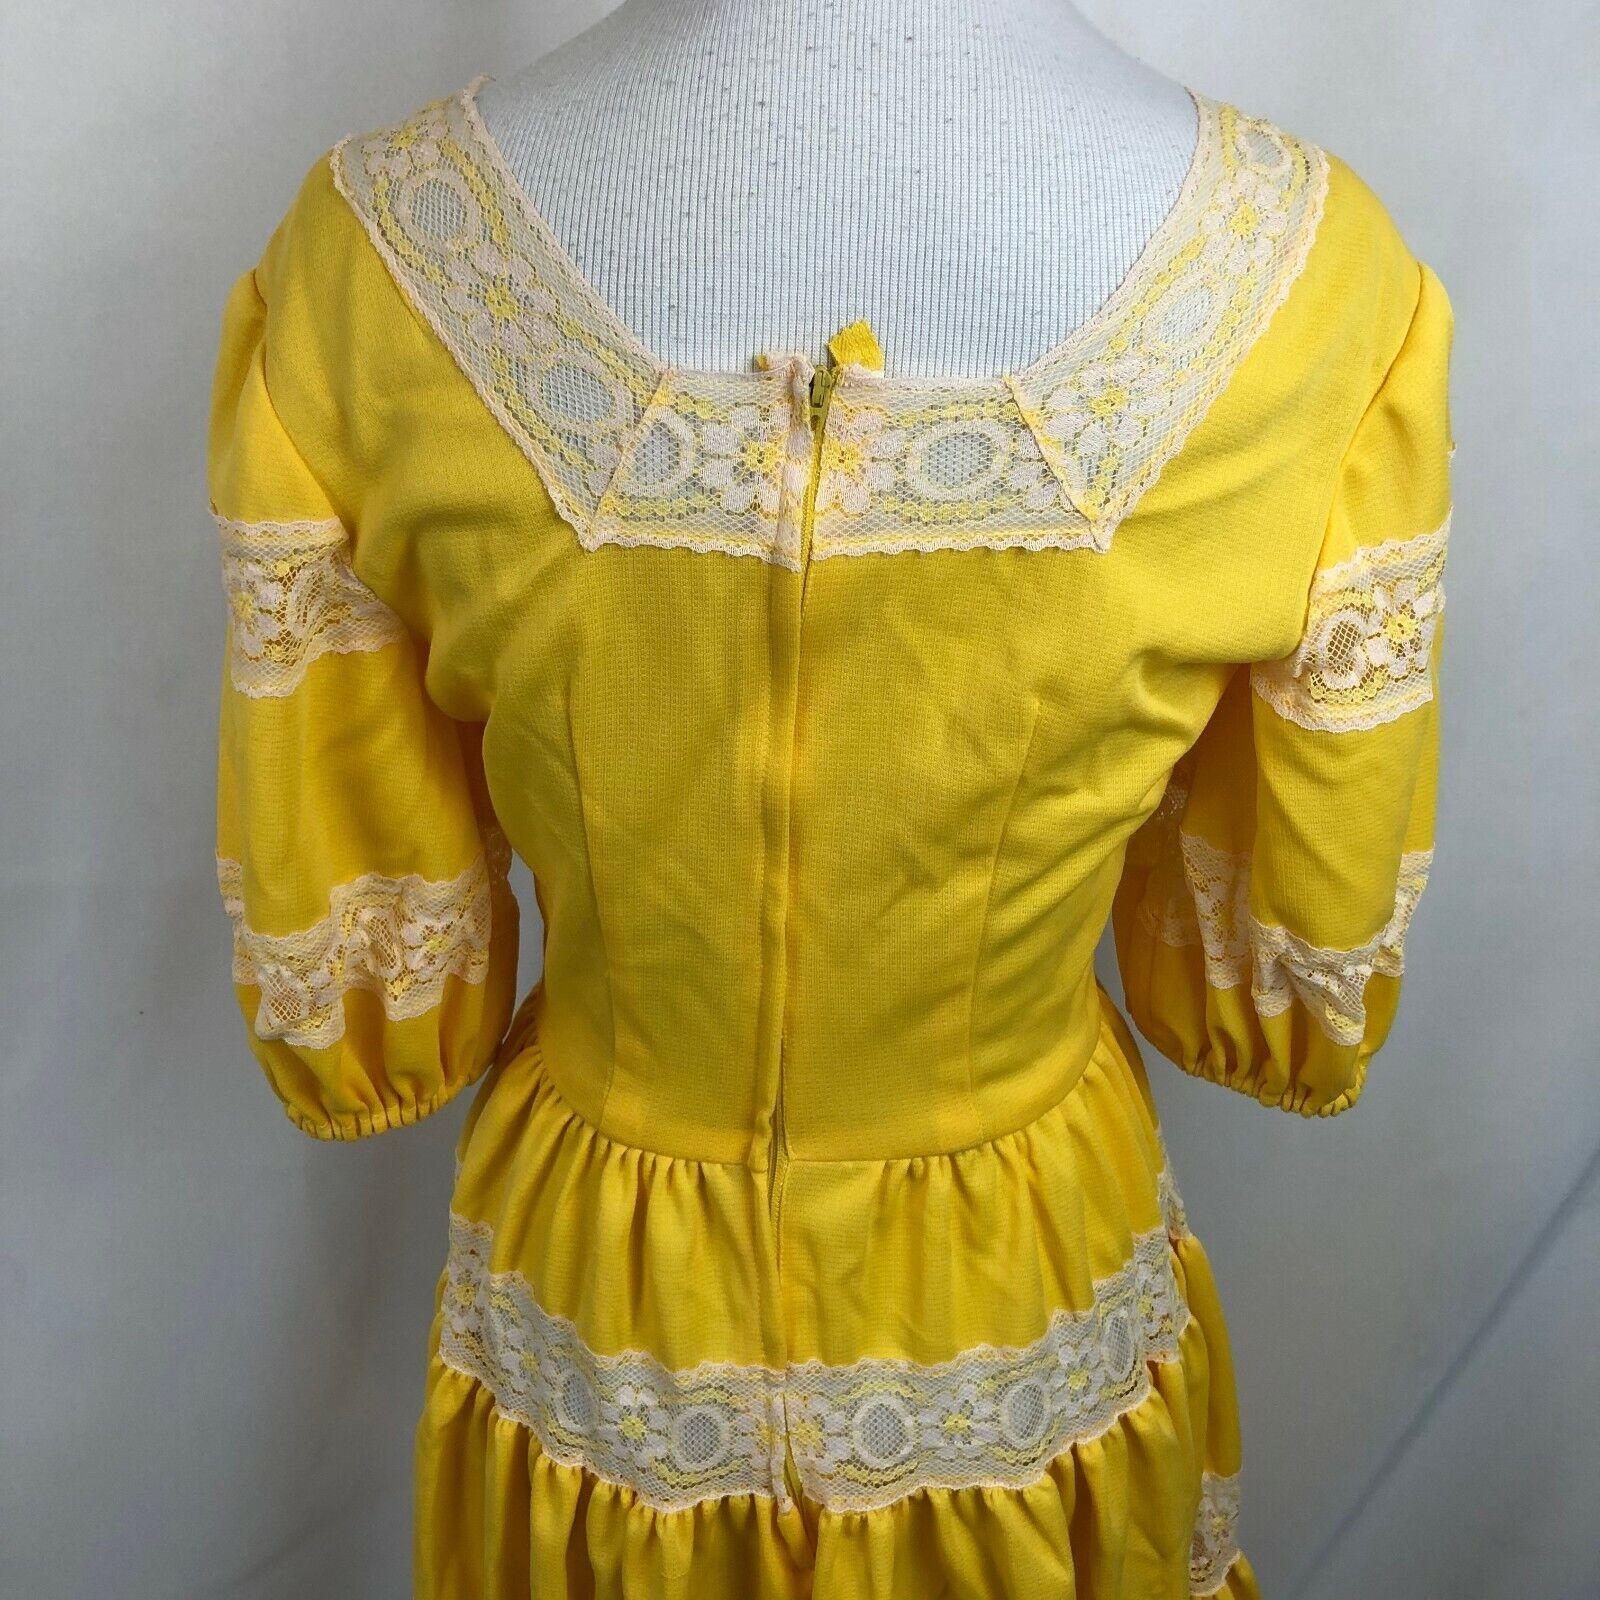 Vintage Lolita Dress Bright Yellow S/M See measur… - image 8